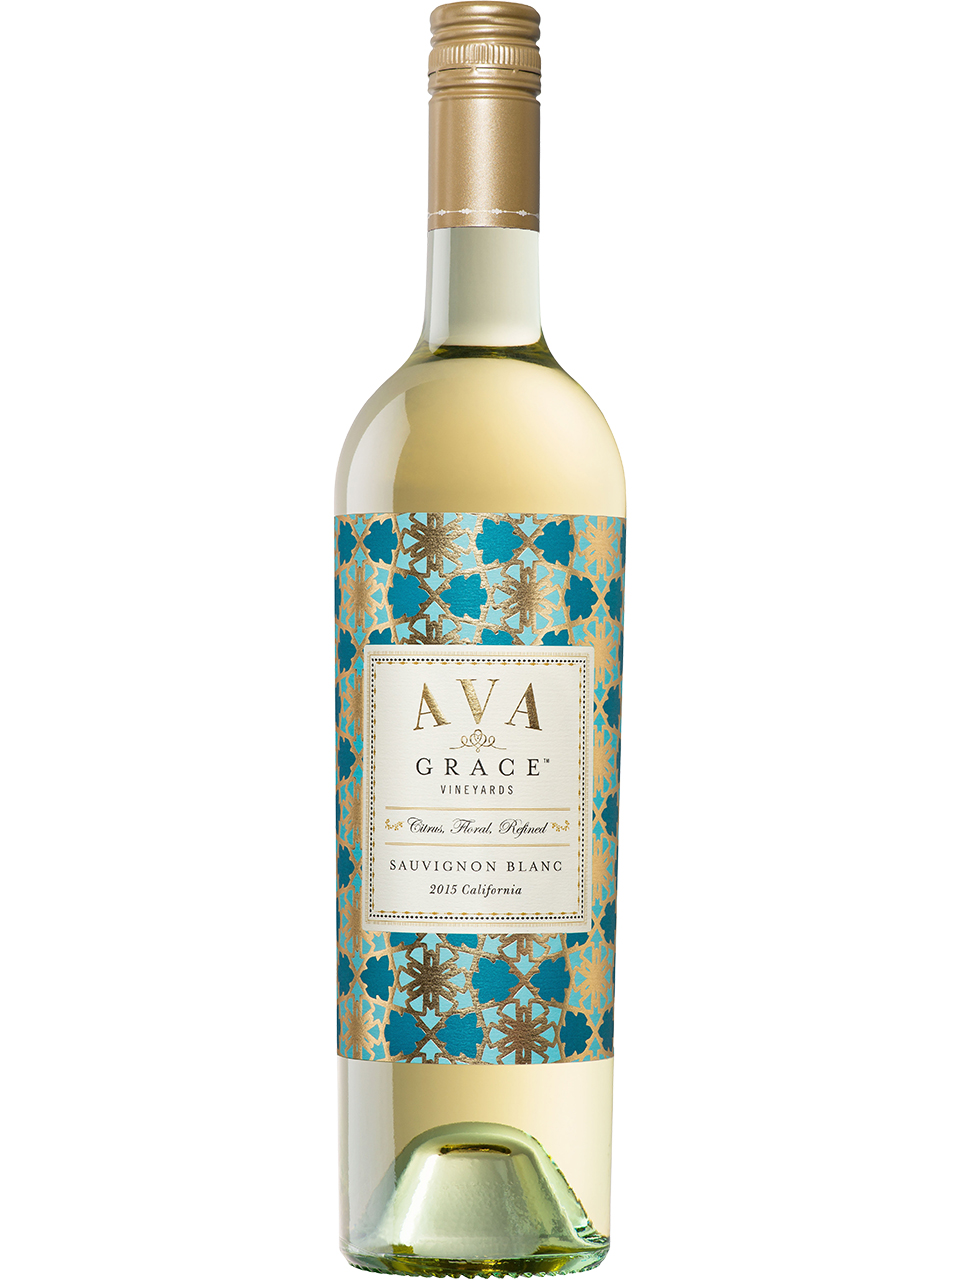 AVA Grace Sauvignon Blanc